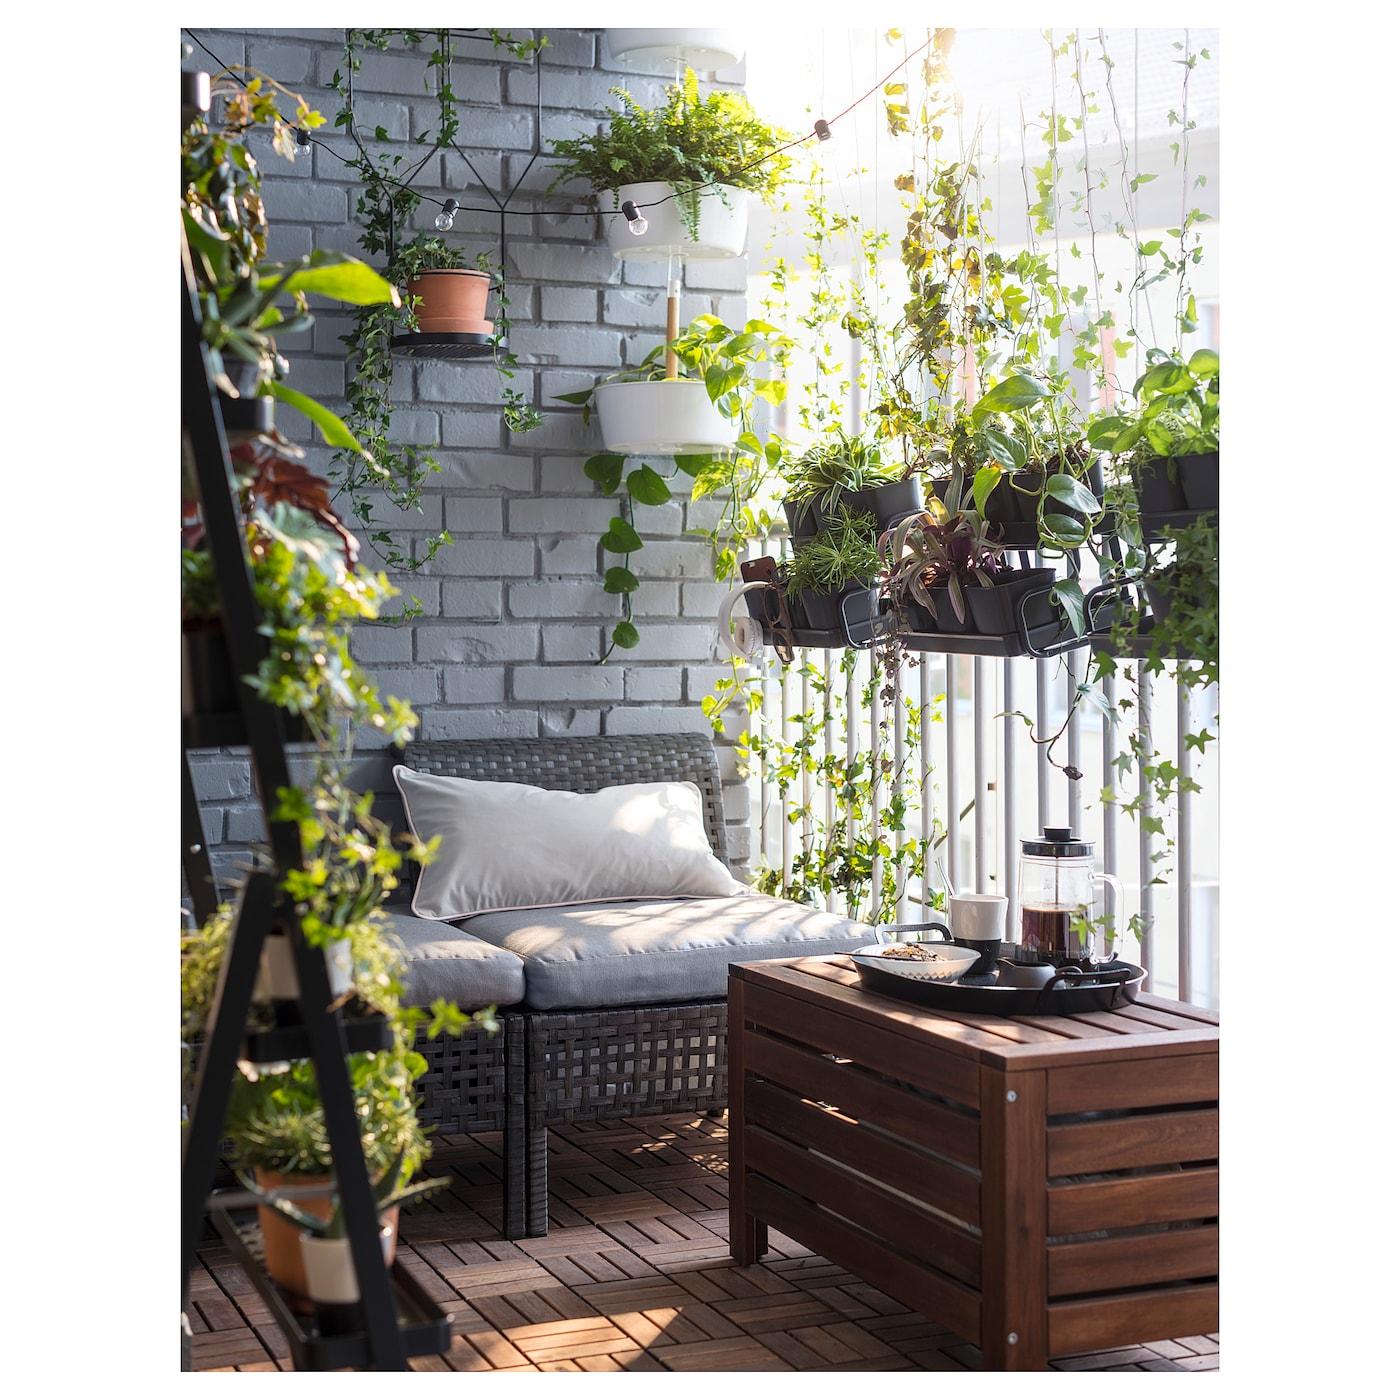 Ikea ÄpplarÖ Storage Bench Outdoor